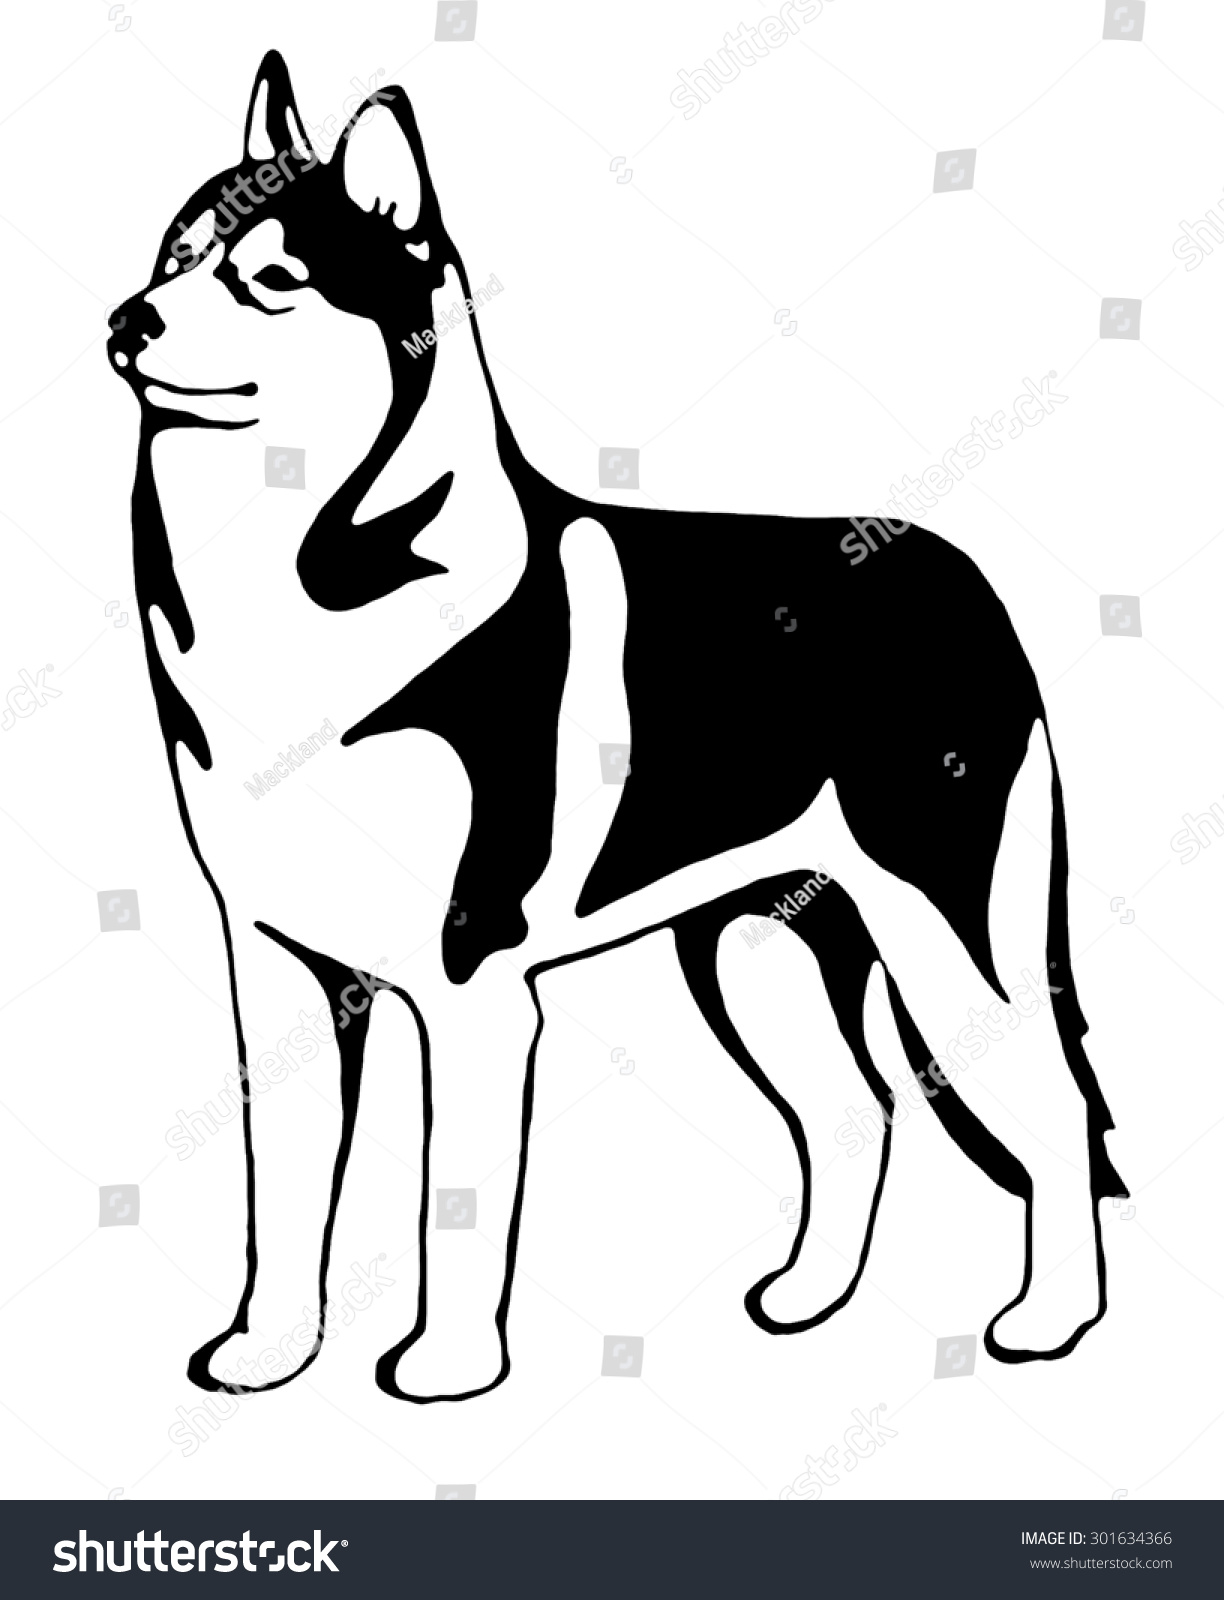 black white siberian husky graphic stock illustration 301634366